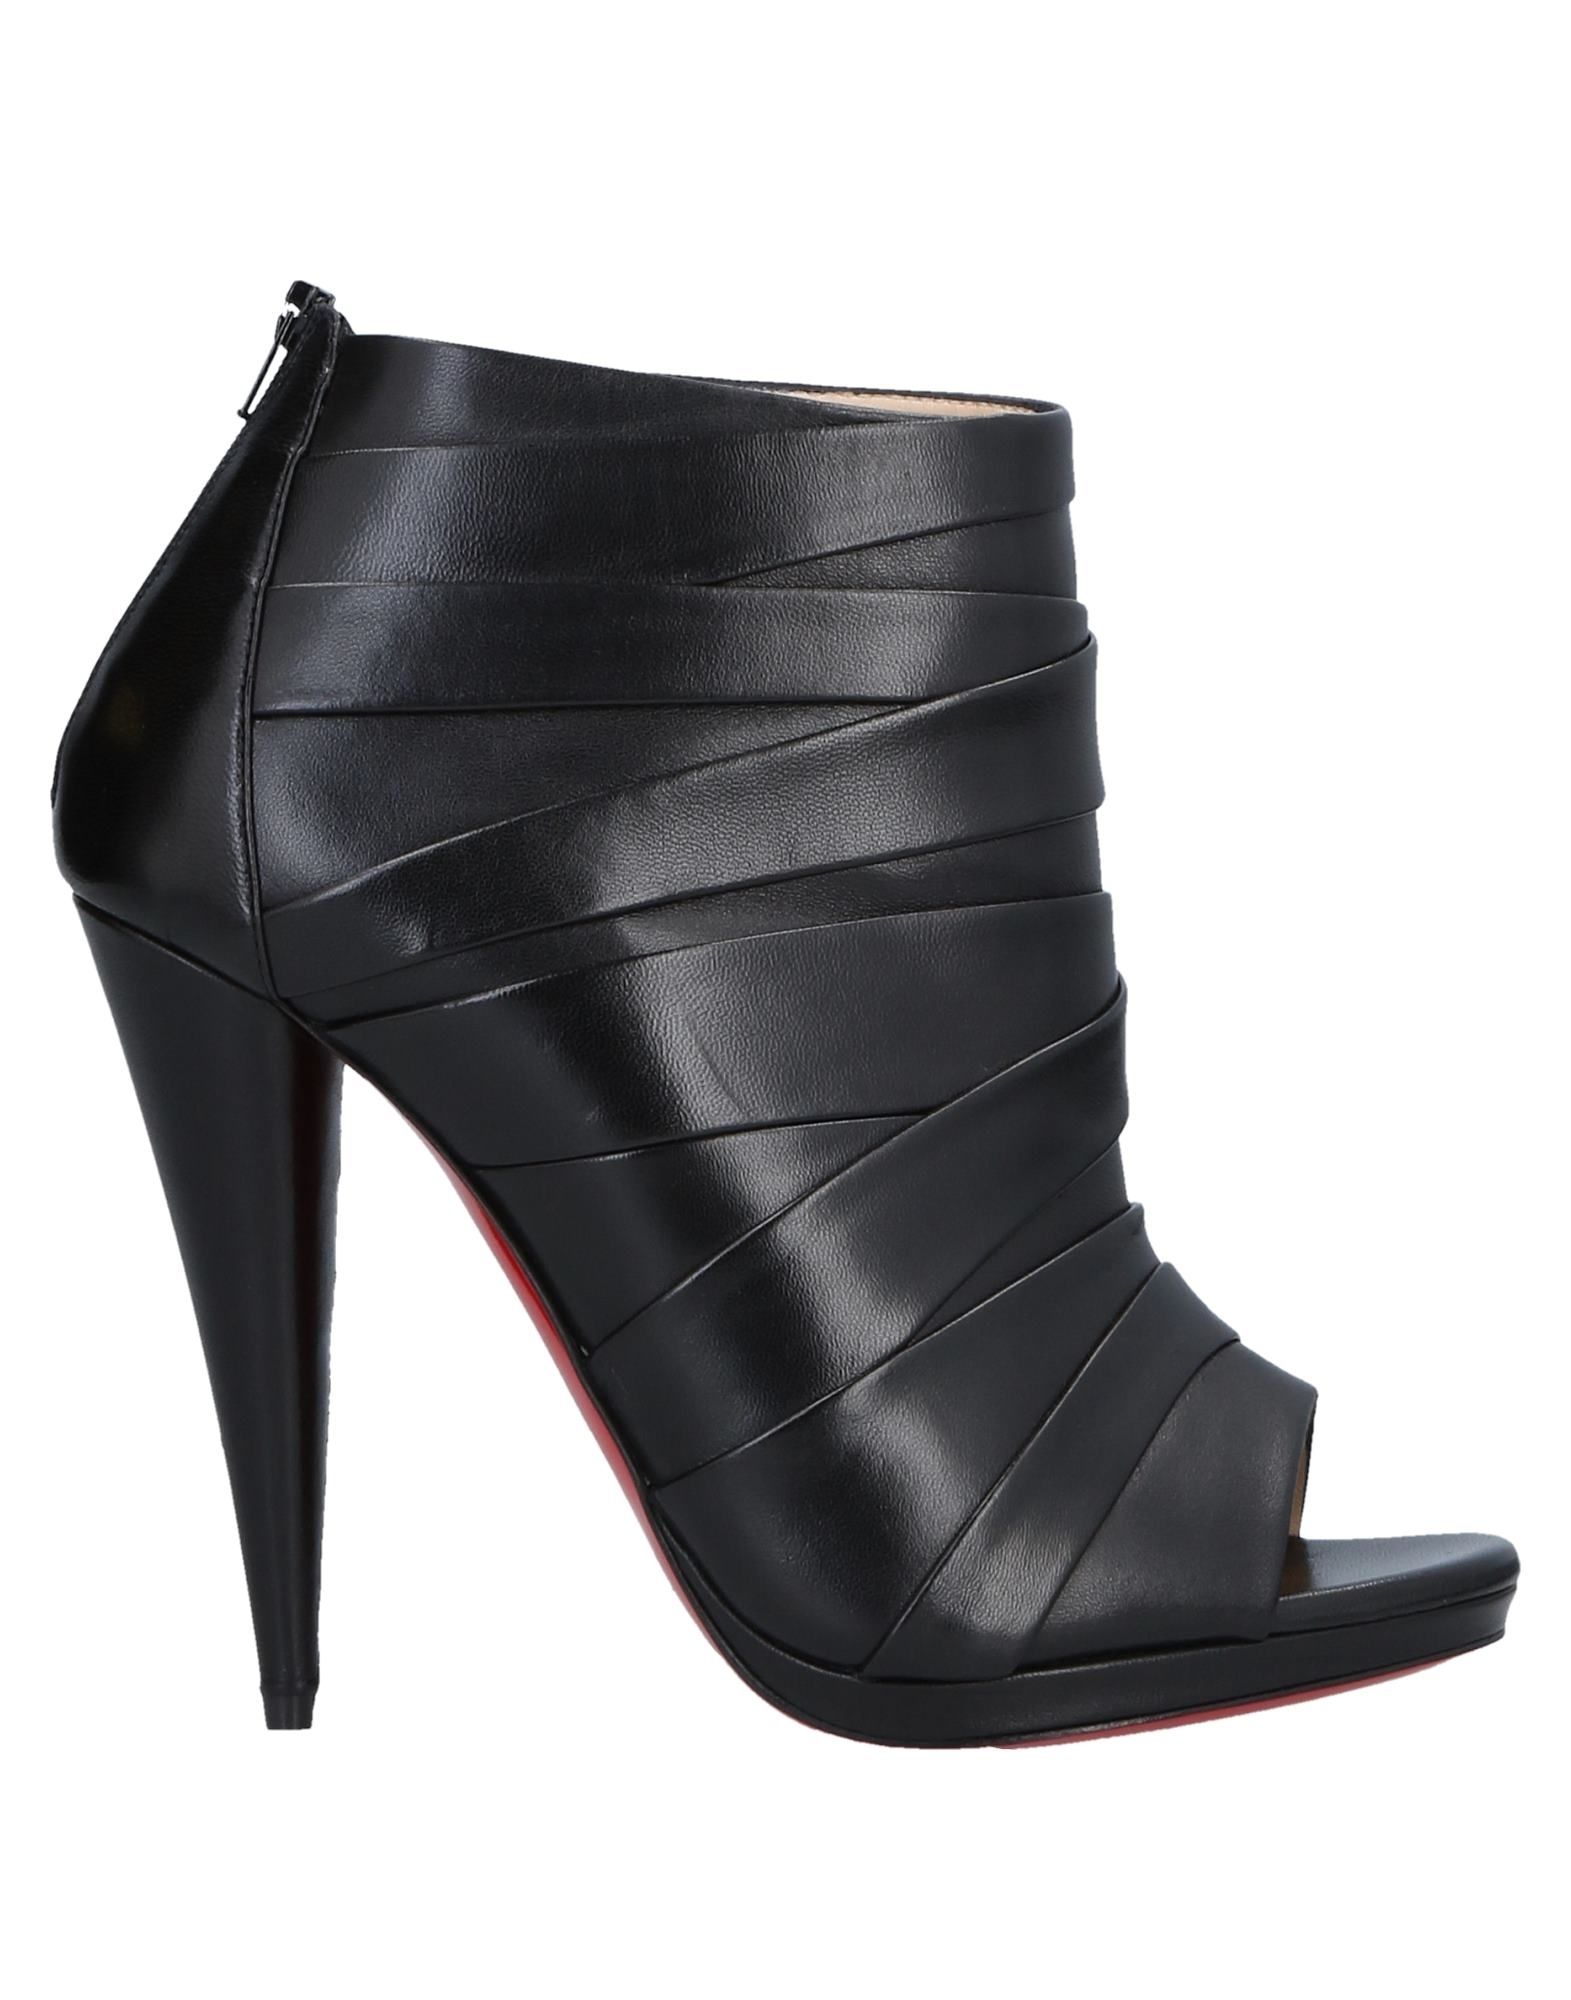 CHRISTIAN LOUBOUTIN Полусапоги и высокие ботинки christian louboutin черные замшевые ботинки samson flat crosta